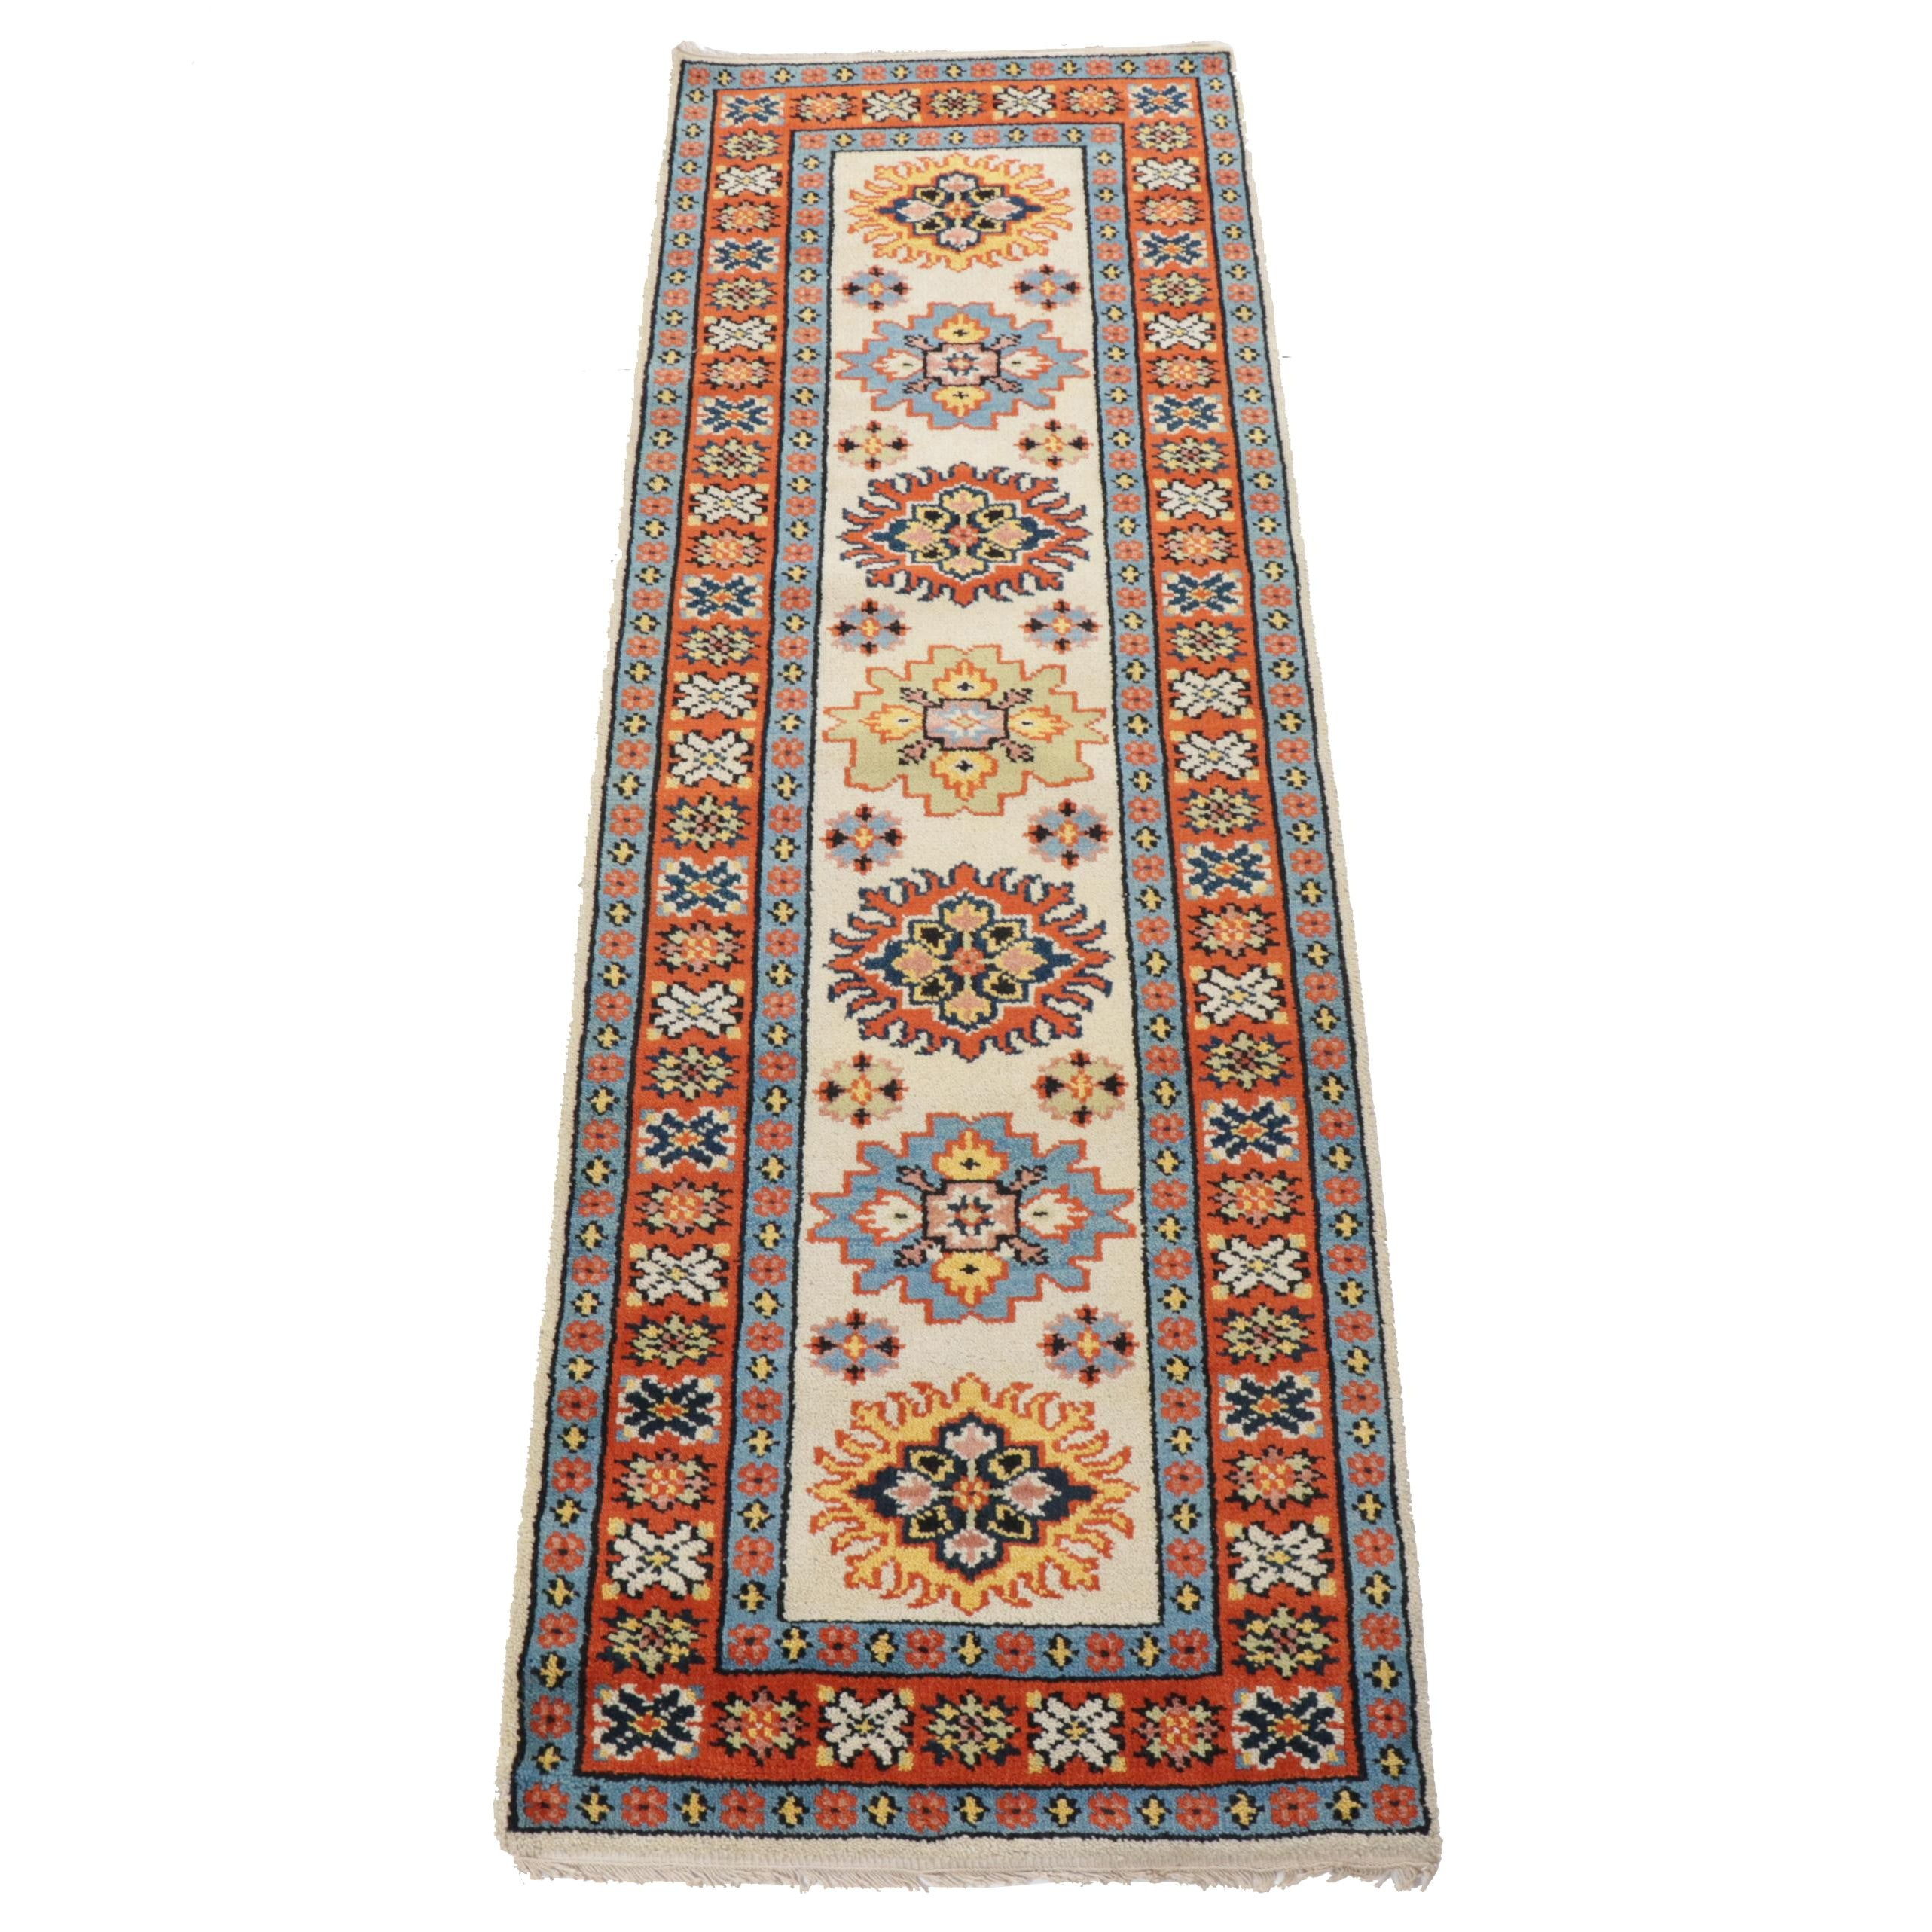 Hand-Knotted Indo-Persian Heriz Carpet Runner